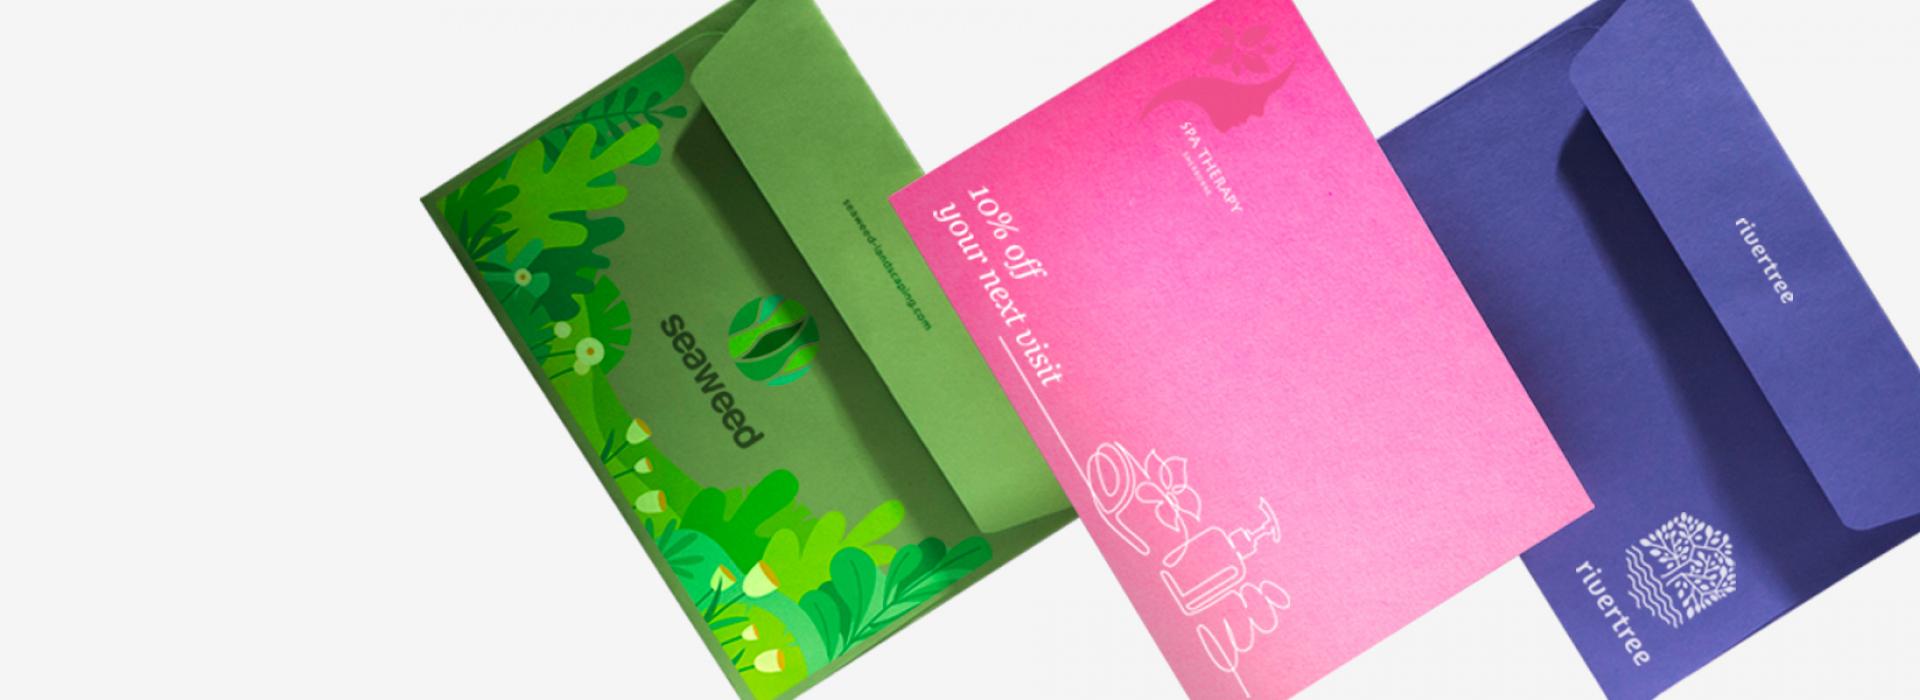 Web to Print Personalised Printed Envelopes